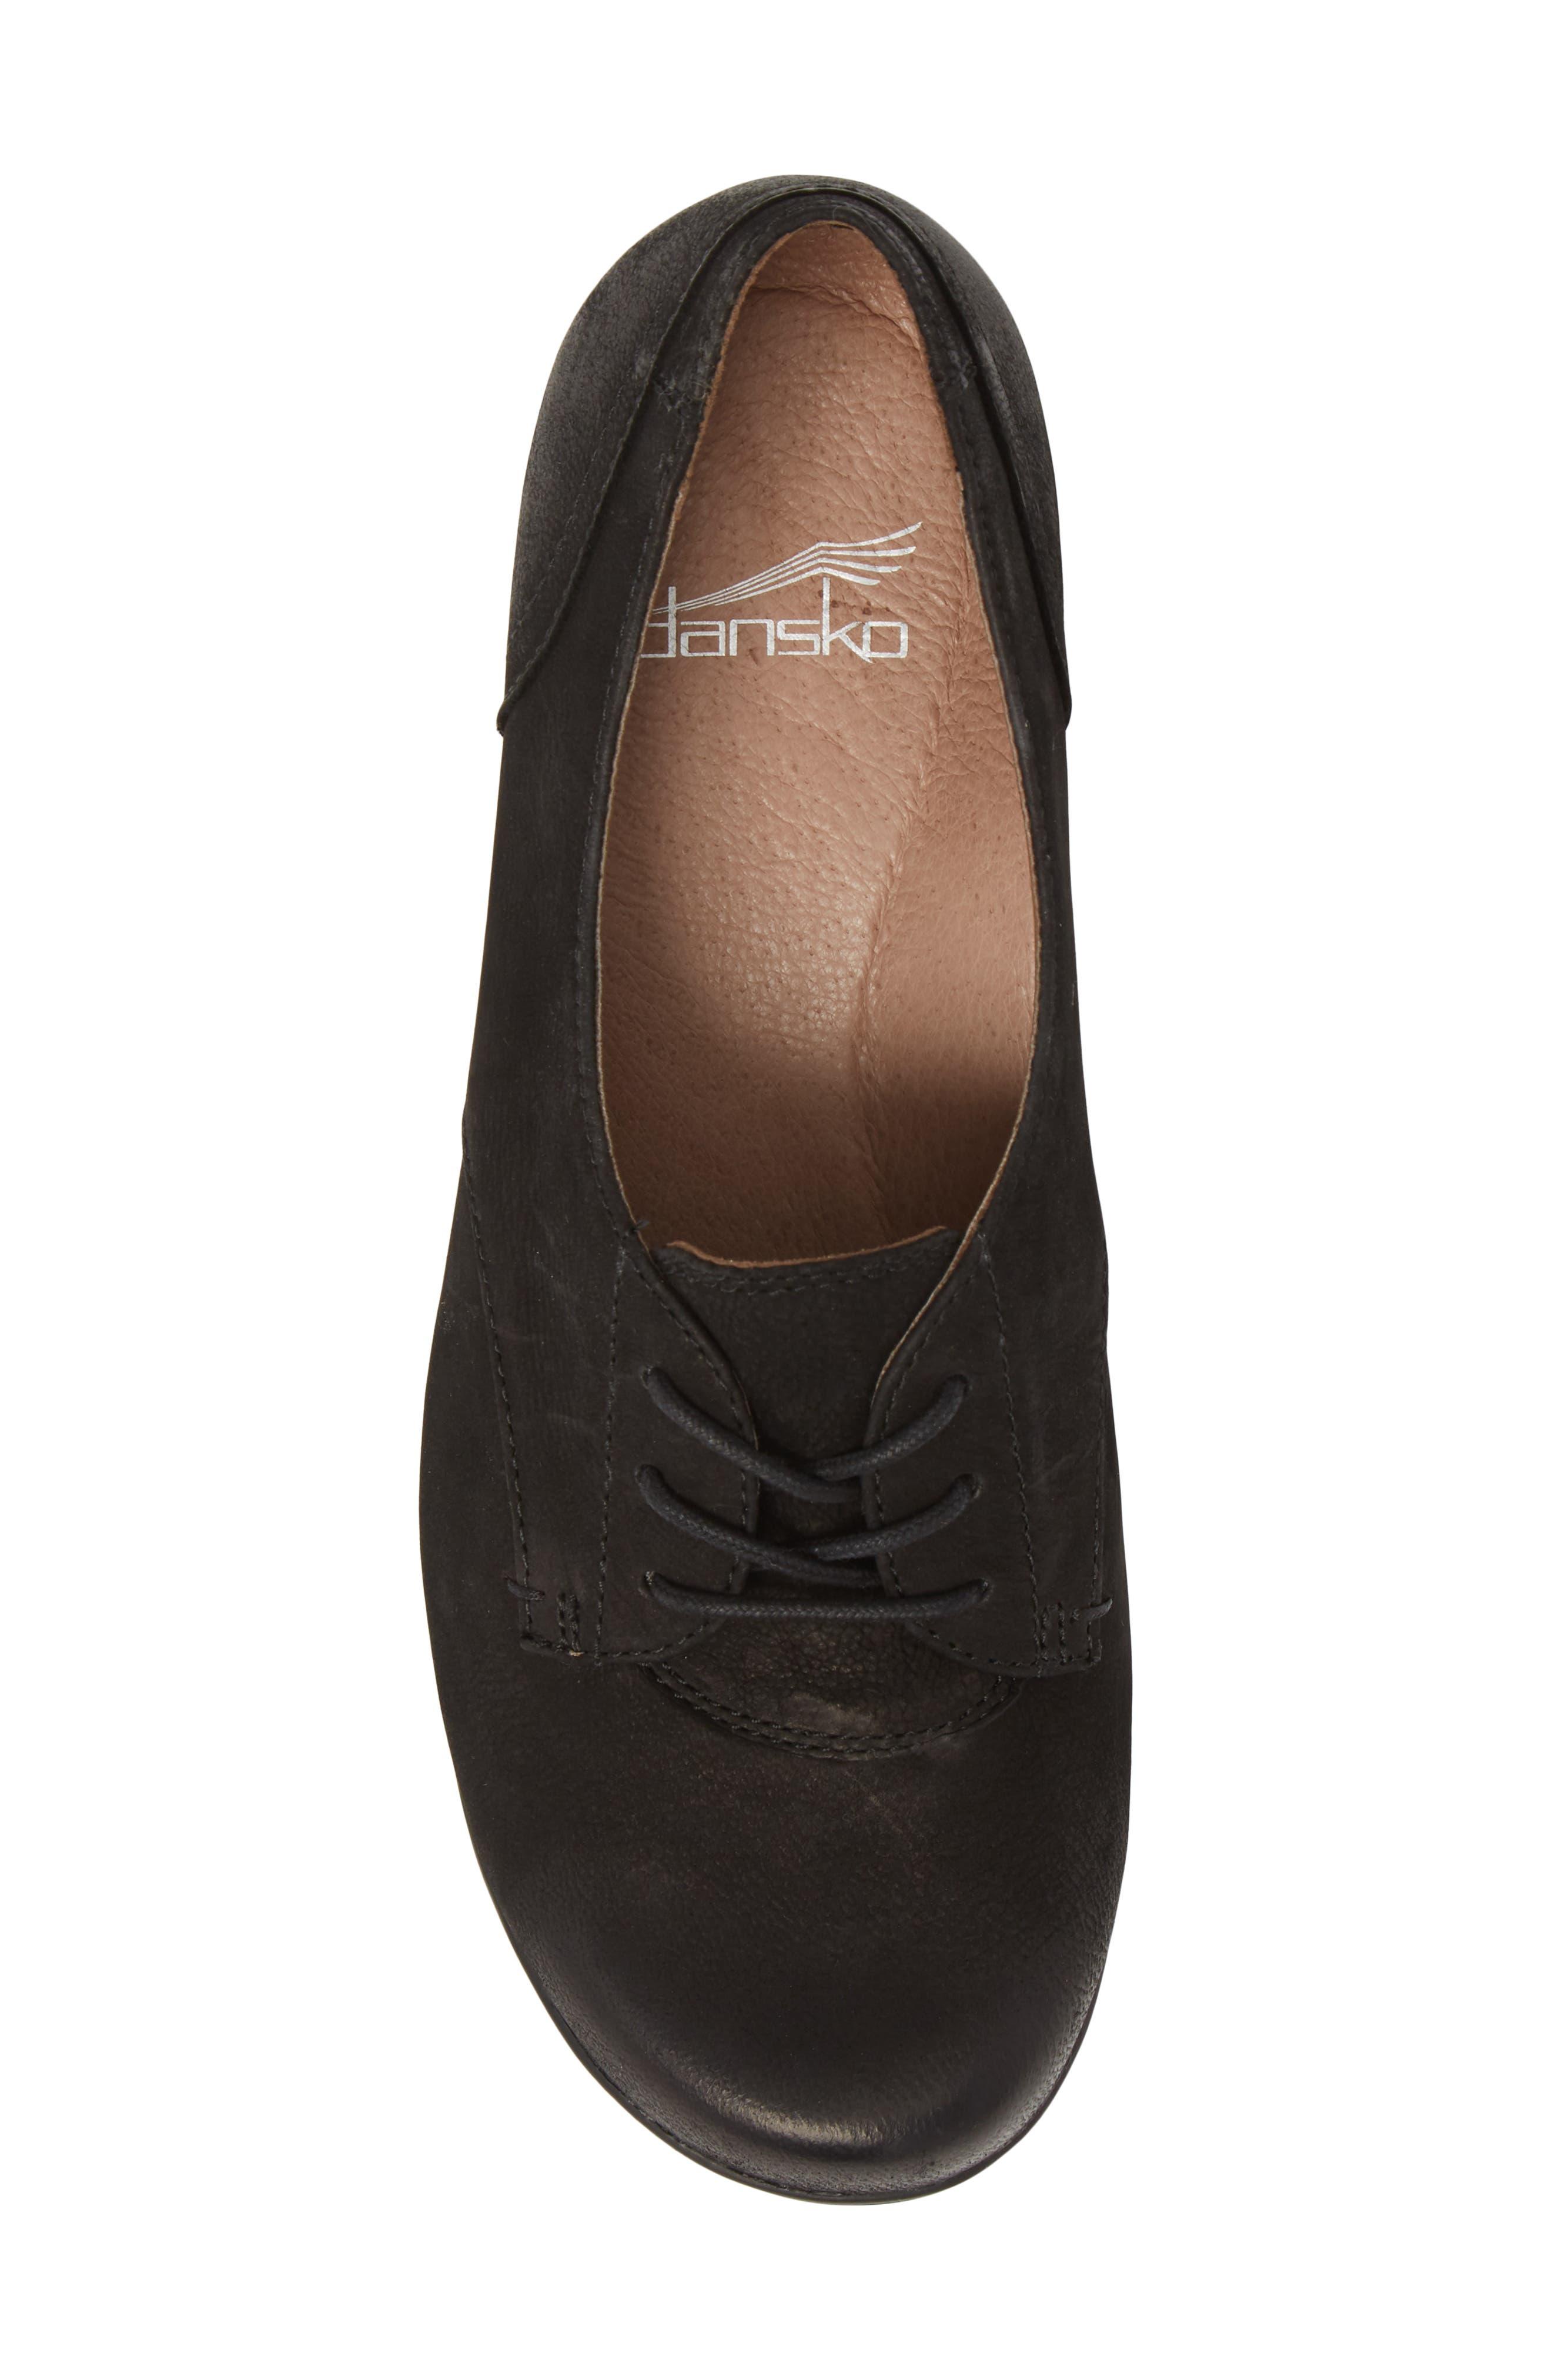 Fallon Derby,                             Alternate thumbnail 3, color,                             Black Burnished Nubuck Leather